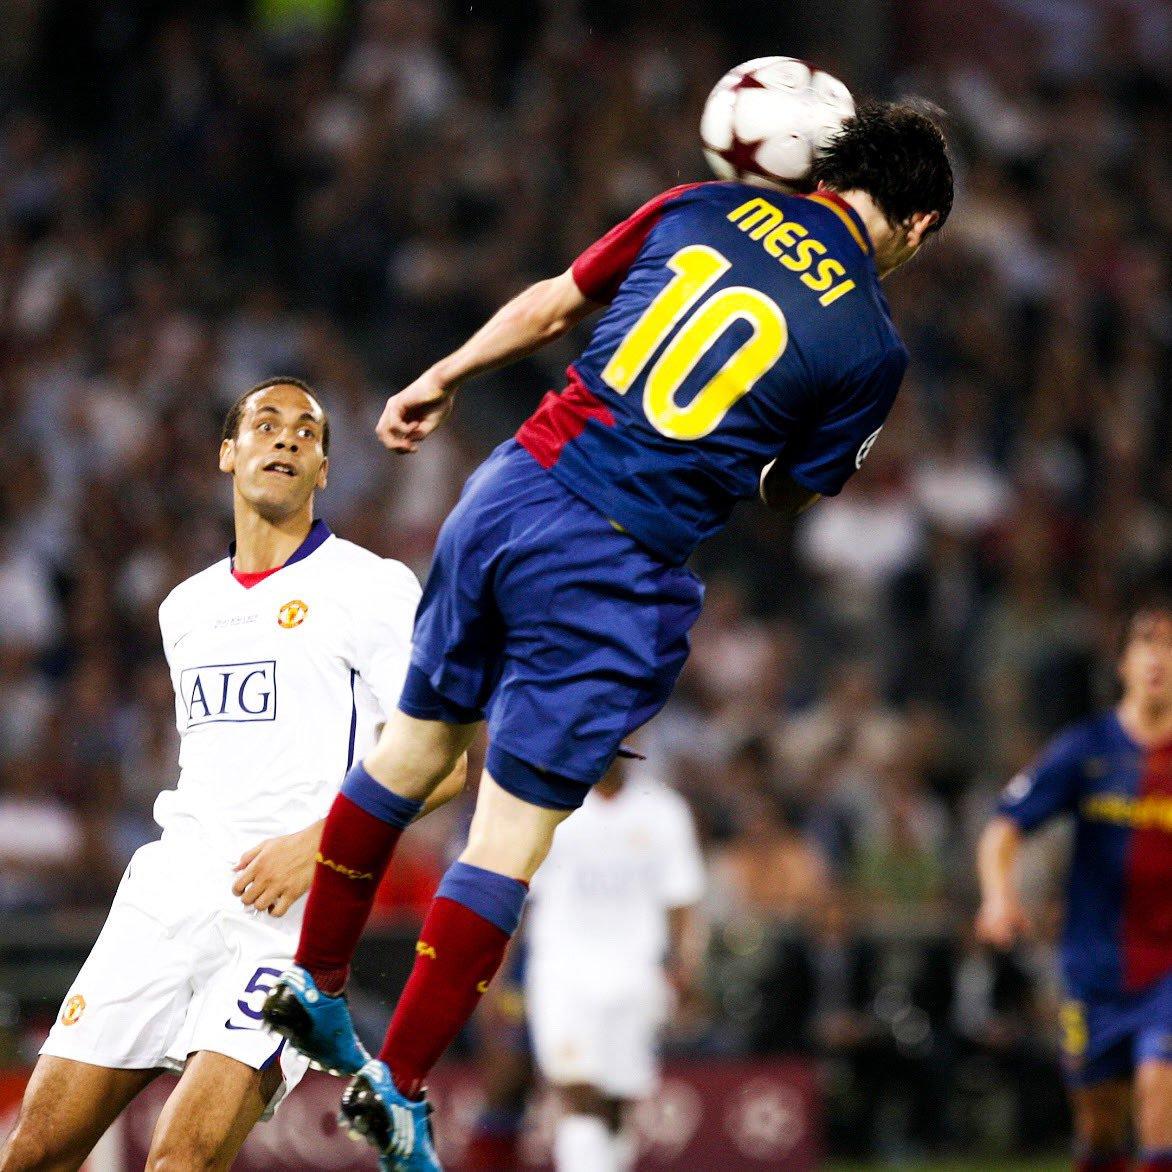 #Messi 🐐